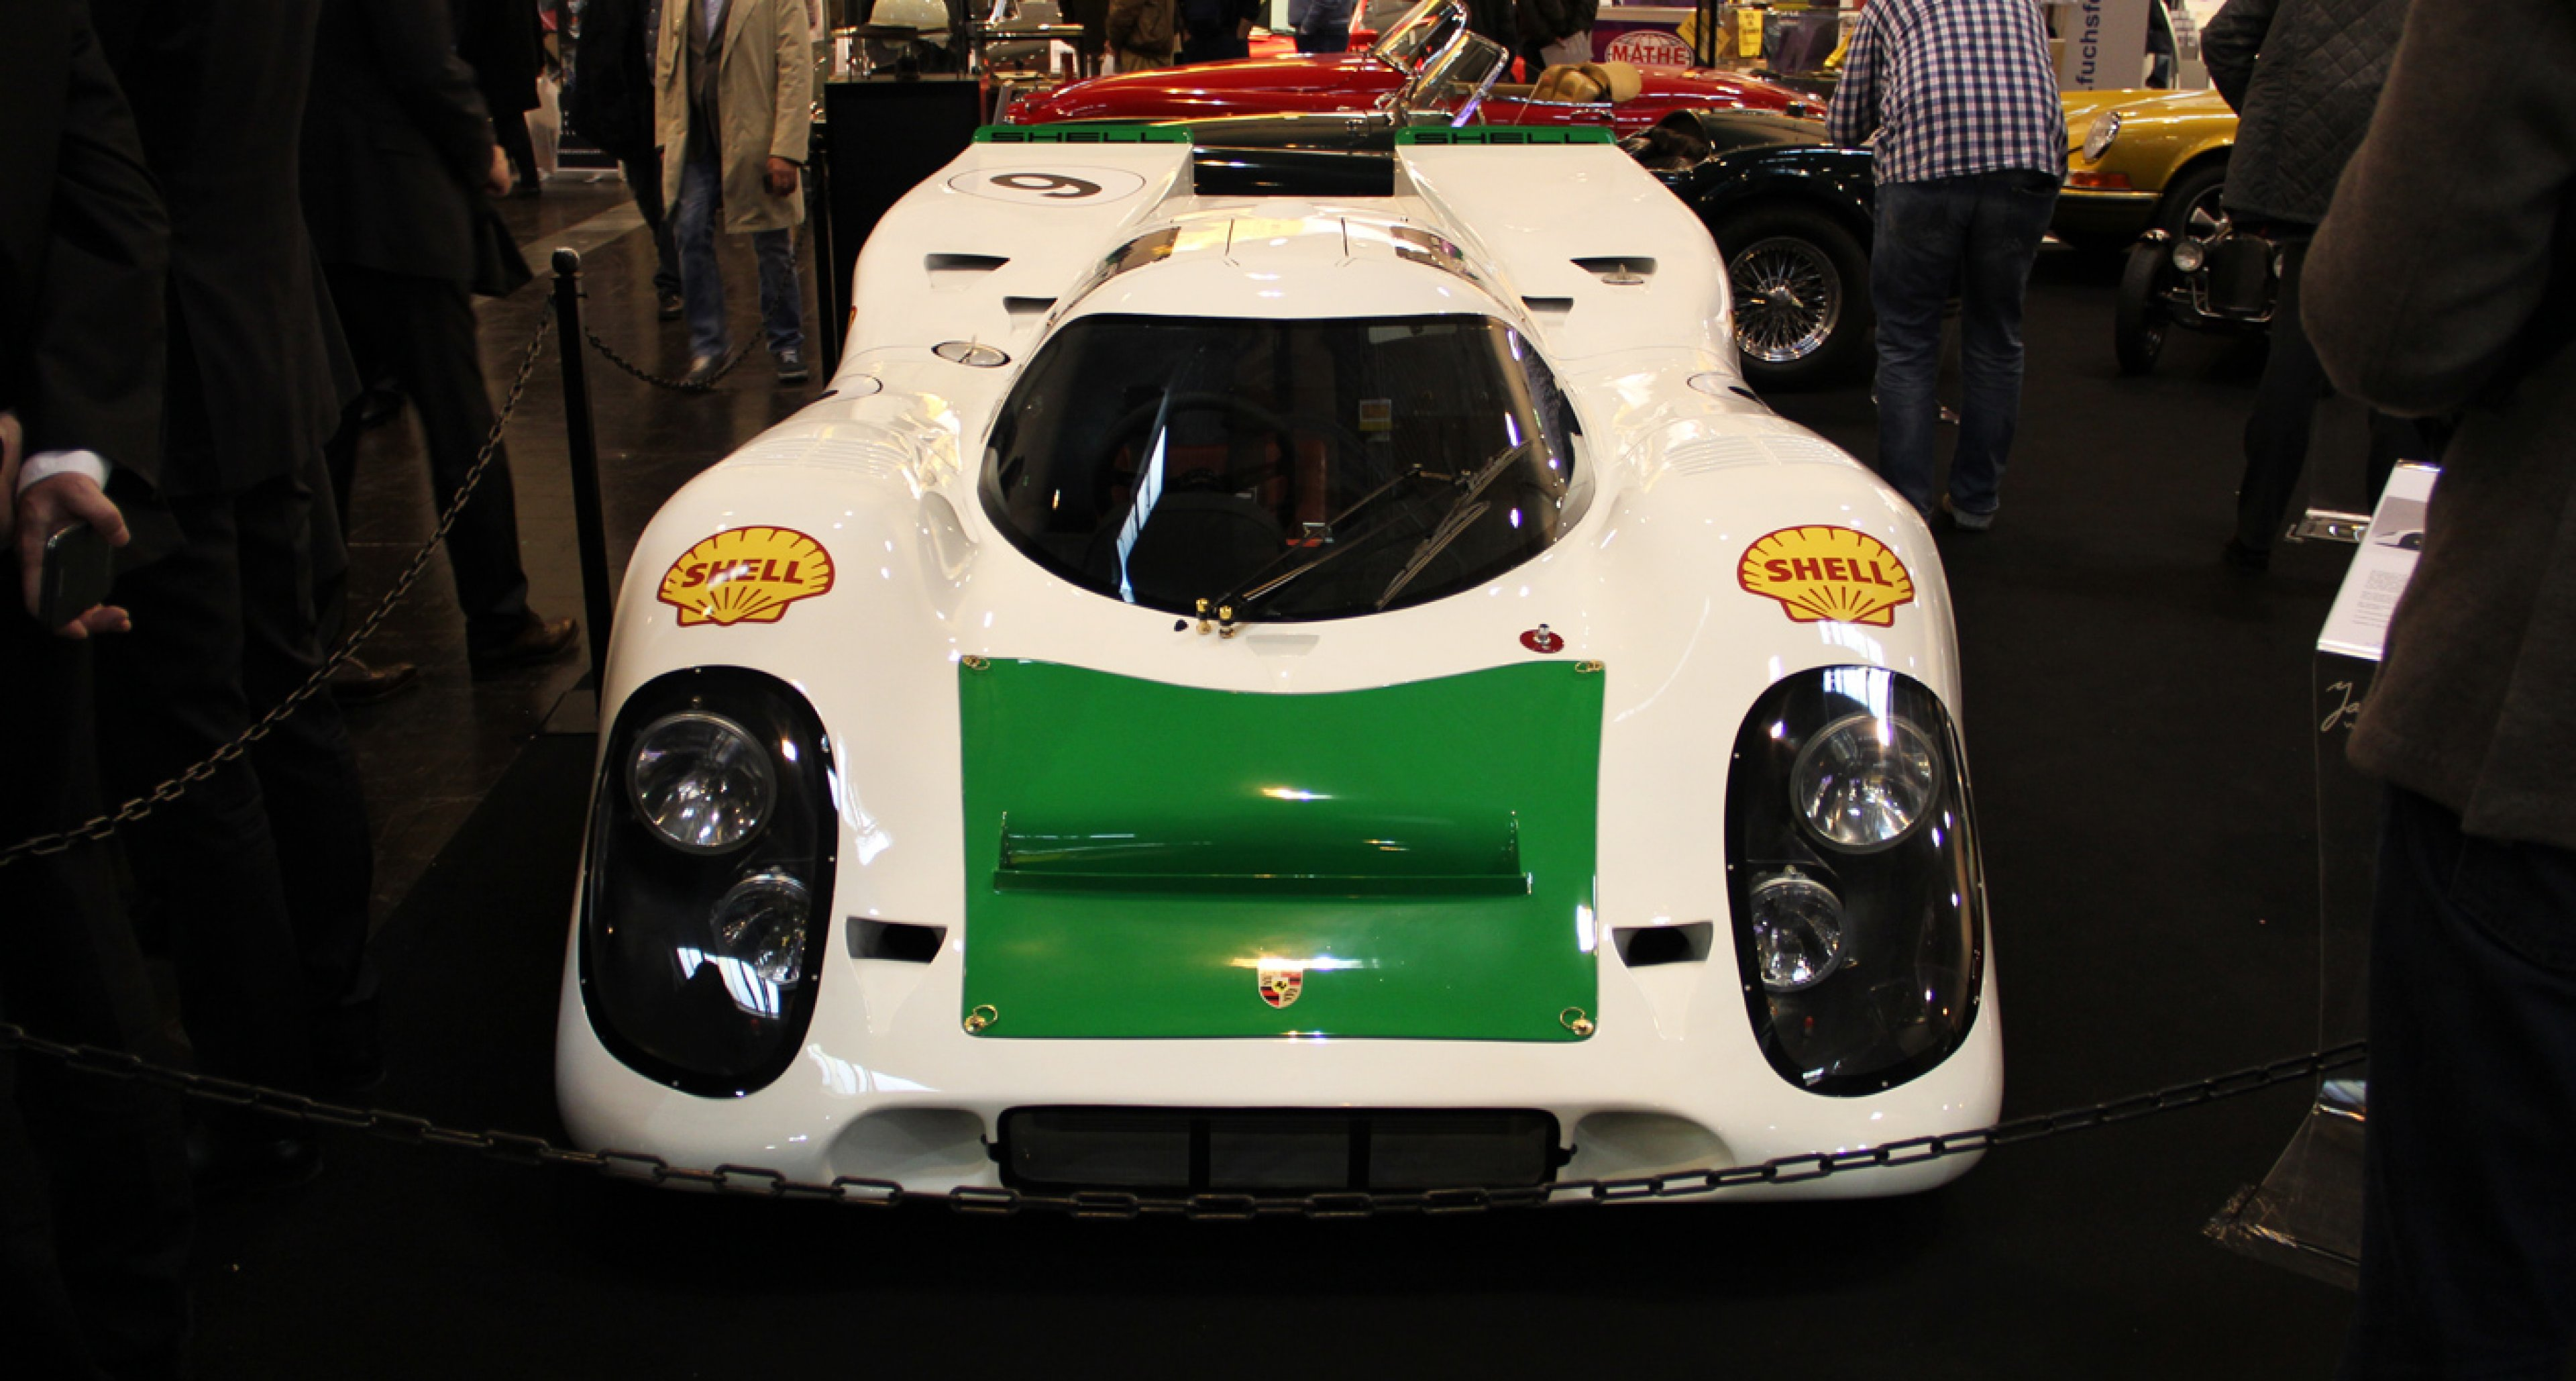 Techno Classica Essen 2014: Porsche 917K on the Jan B. Lühn stand